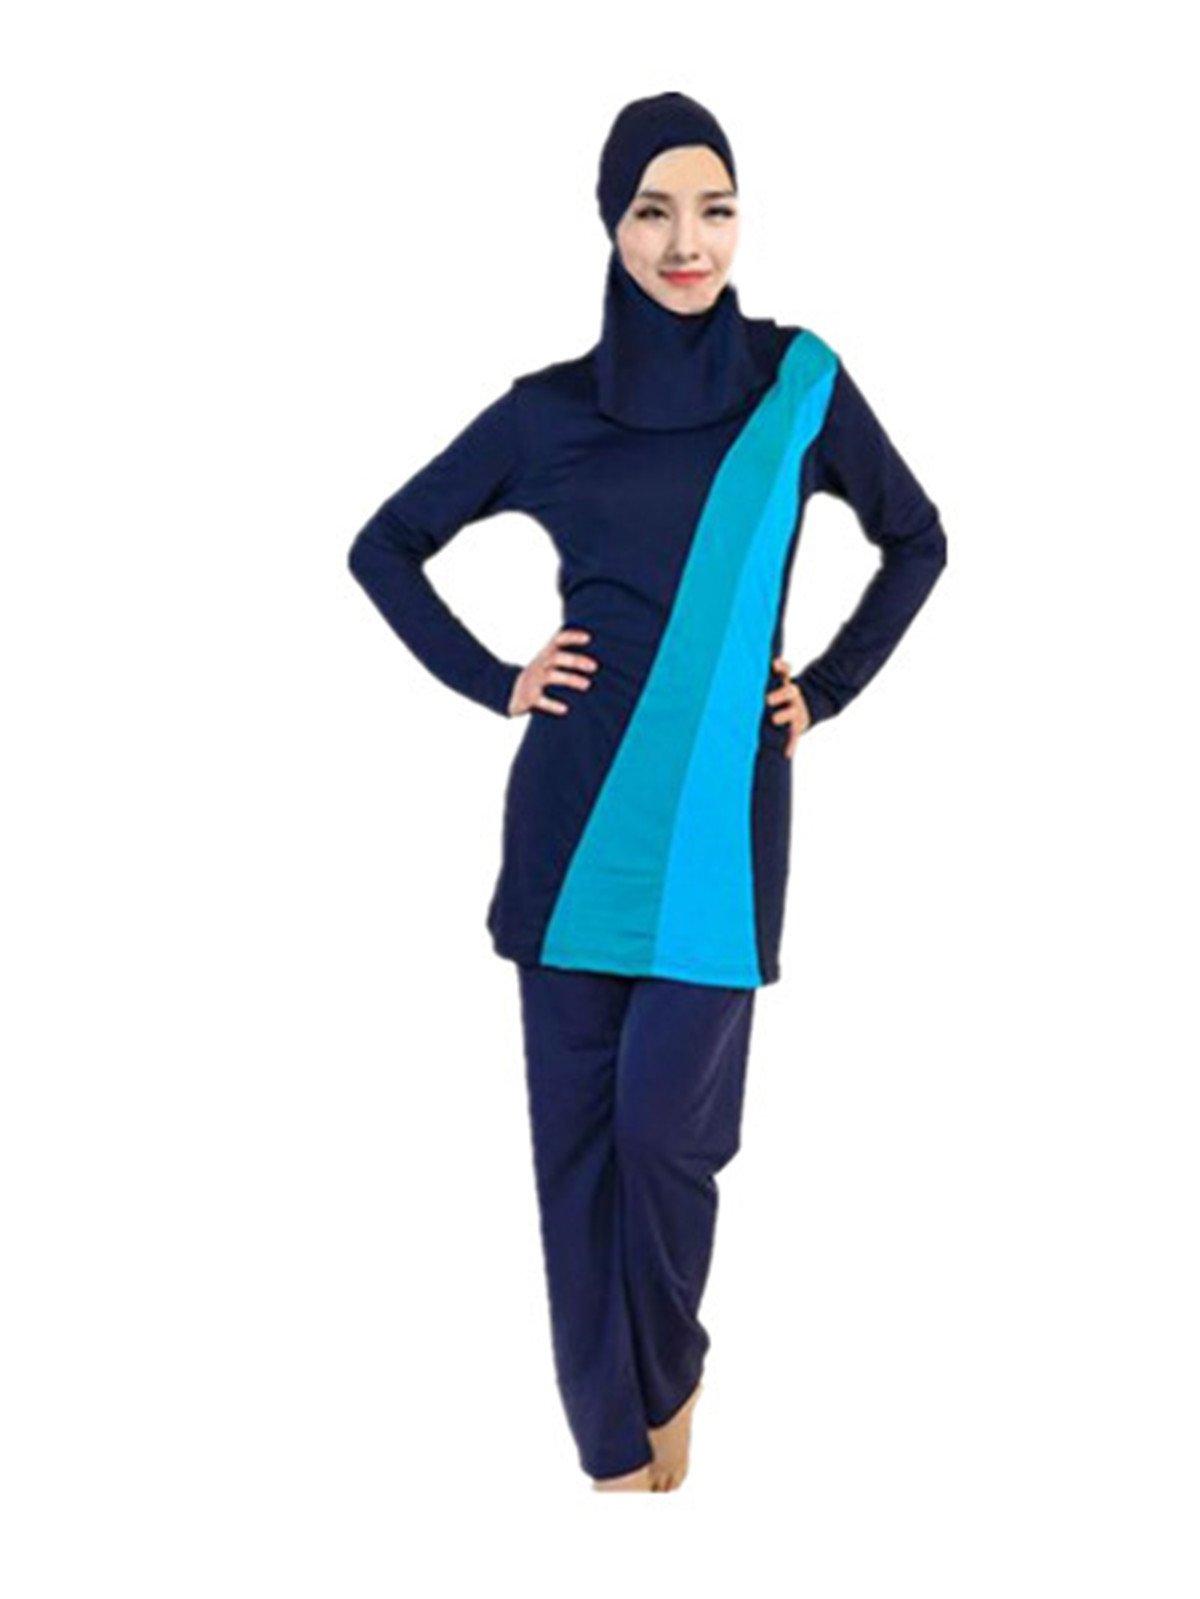 Leright Women's Muslim Swimsuit Color Block Moderate 2 Piece Beachwear Burkini, Blue, XXXXL(US Size XXL)